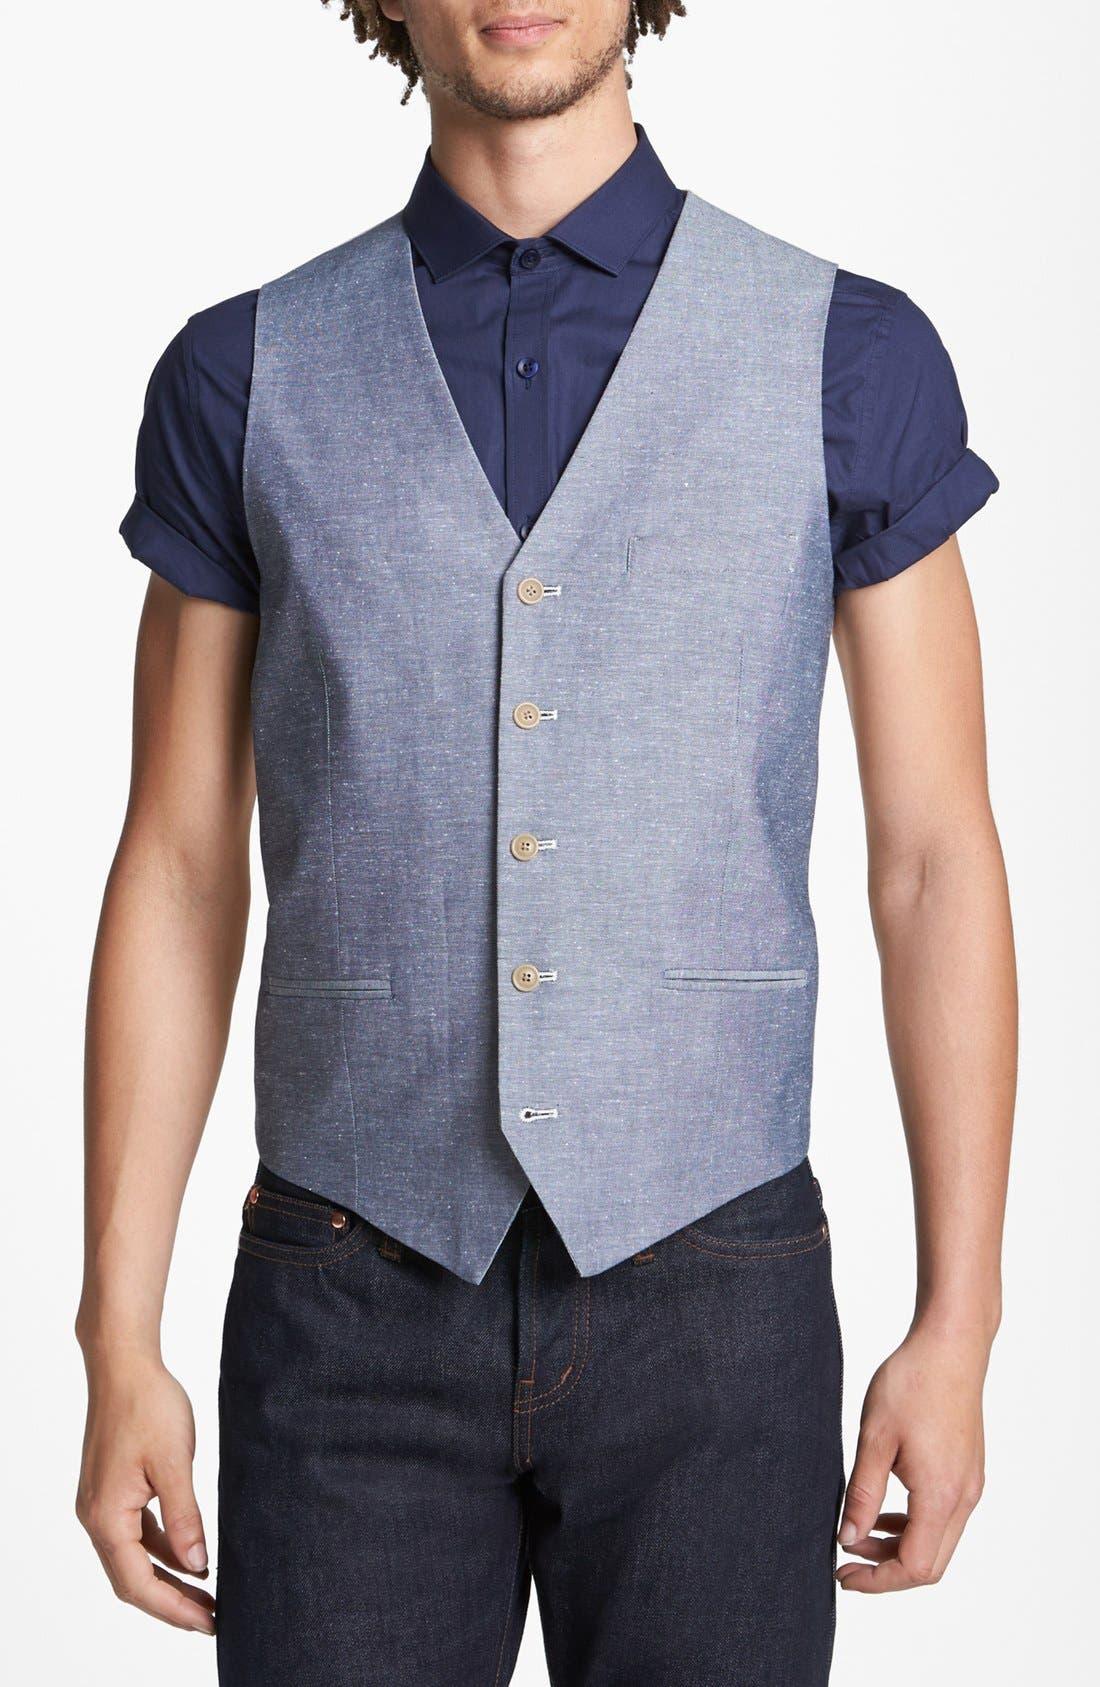 Main Image - Topman Trim Fit Oxford Waistcoat